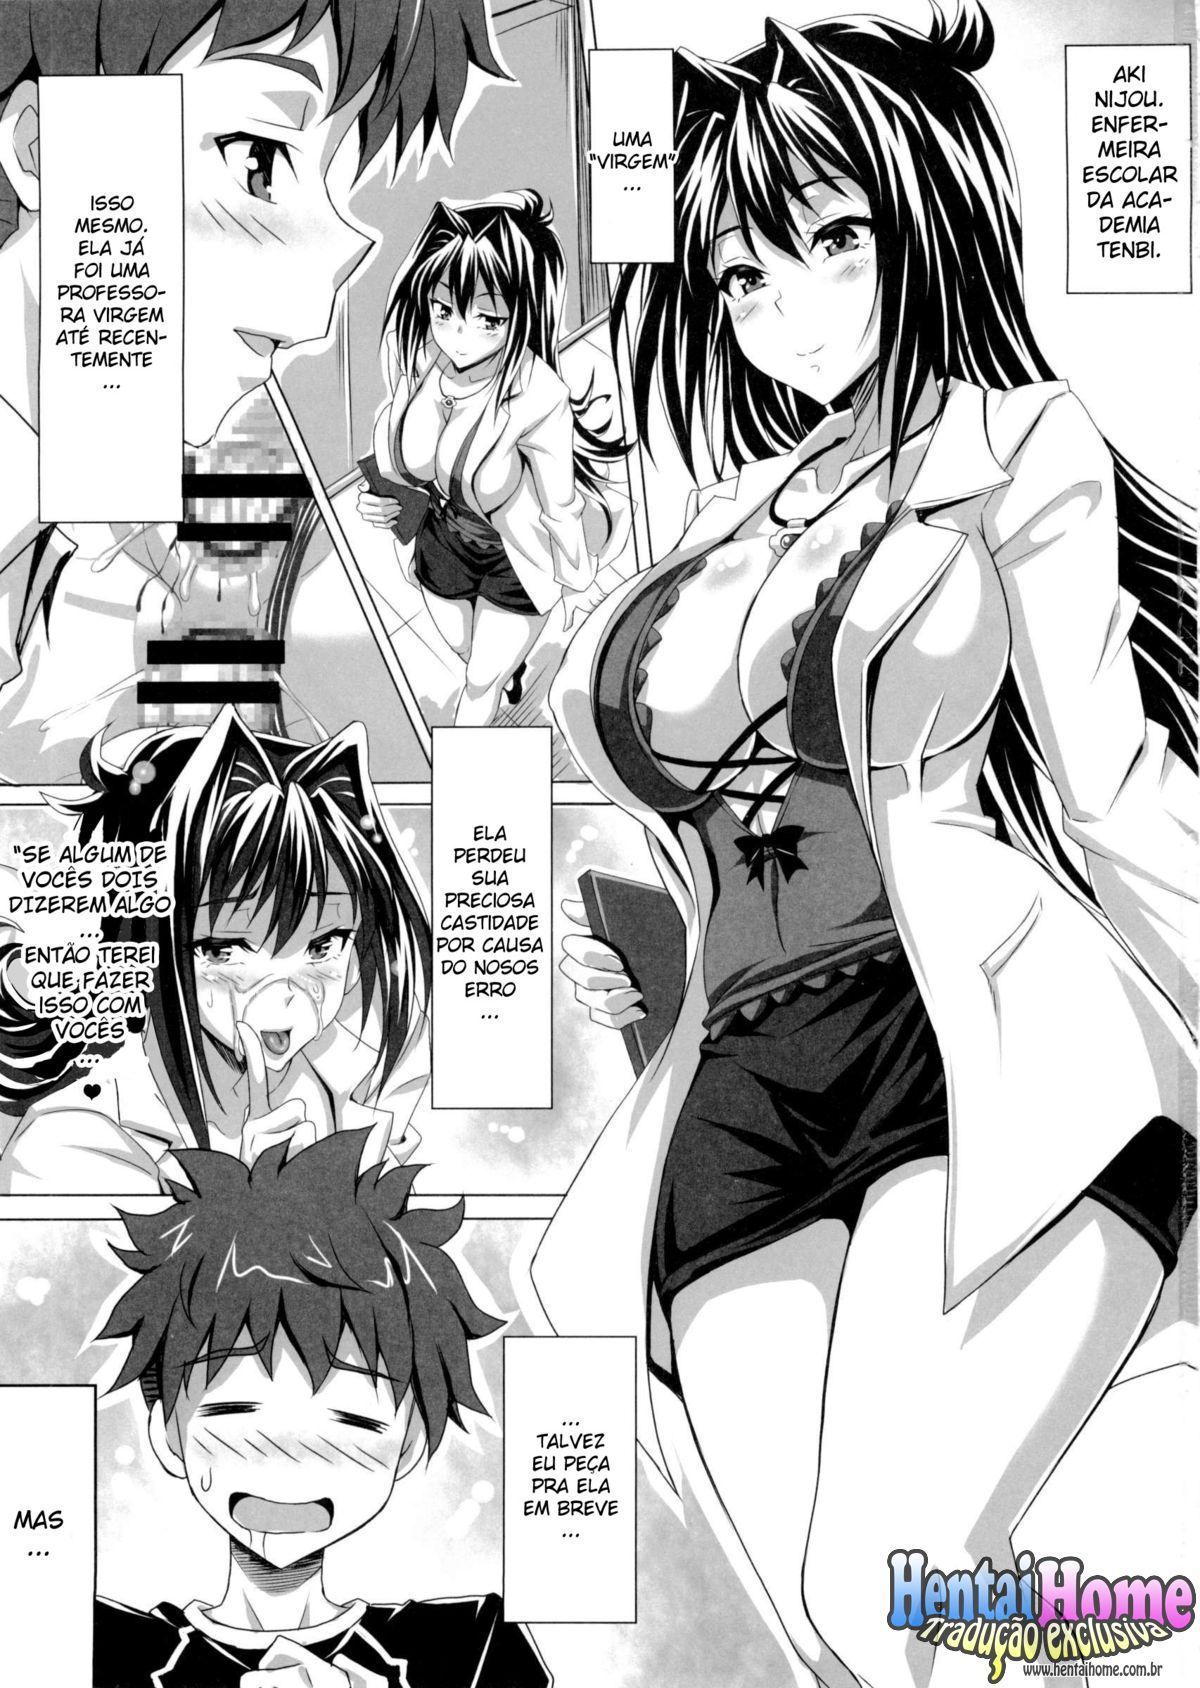 A professora virgem 2